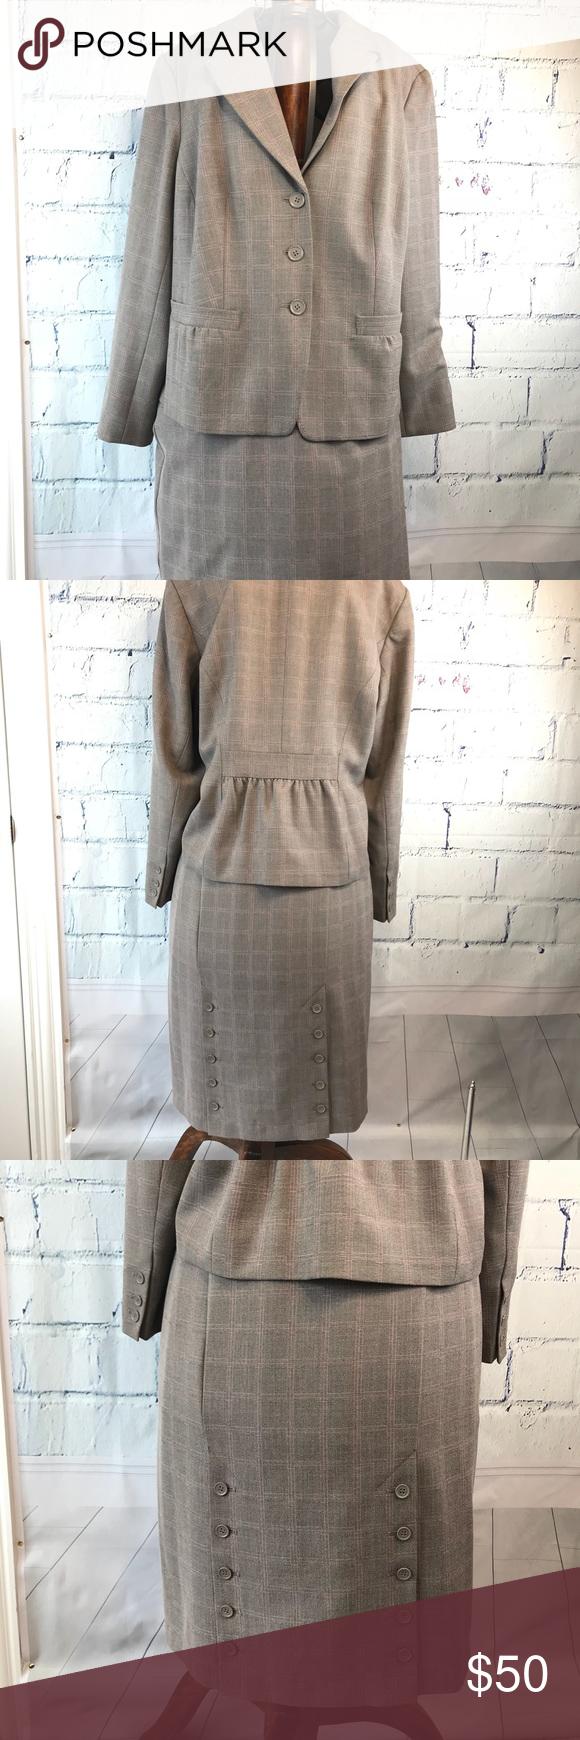 c8465cb9c1e Lane Bryant 2-Piece Blazer 22 and Skirt 24 Suit Lane Bryant Women s Light  Gray